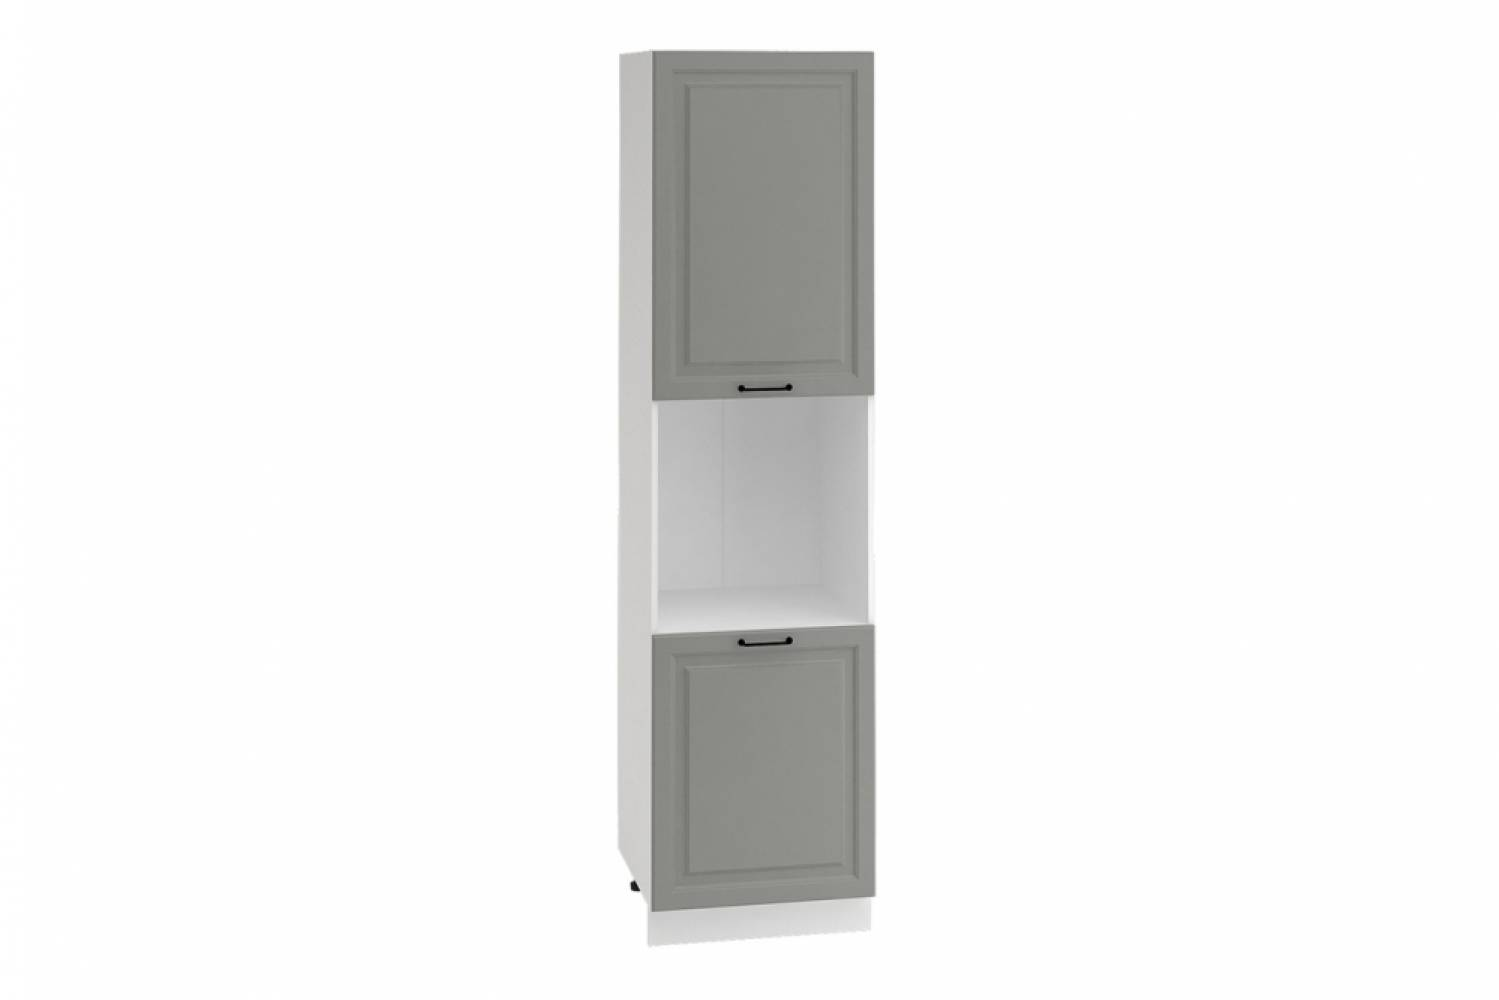 Шкаф пенал высокий ШП 600Н НИЦЦА ROYAL (MAGNUM) 600 мм